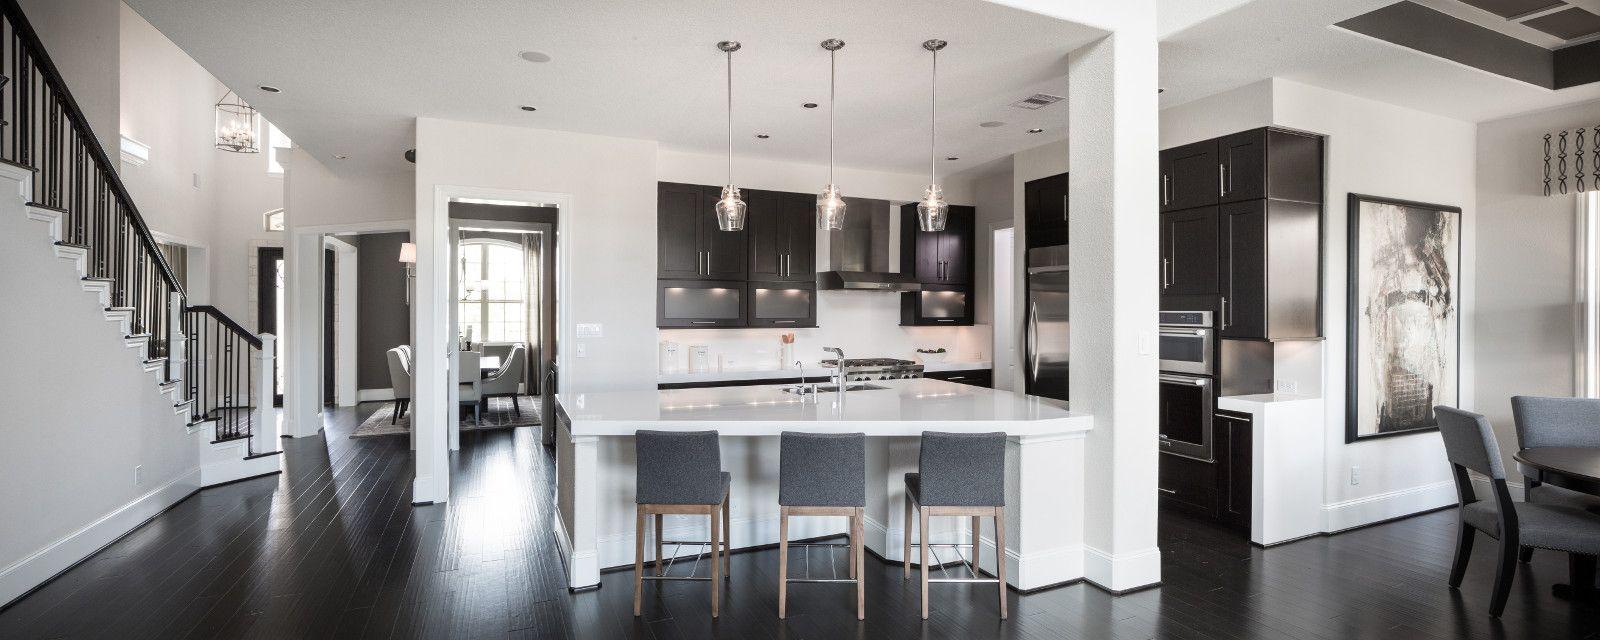 'Aliana' by Ashton Woods Homes-Houston in Houston